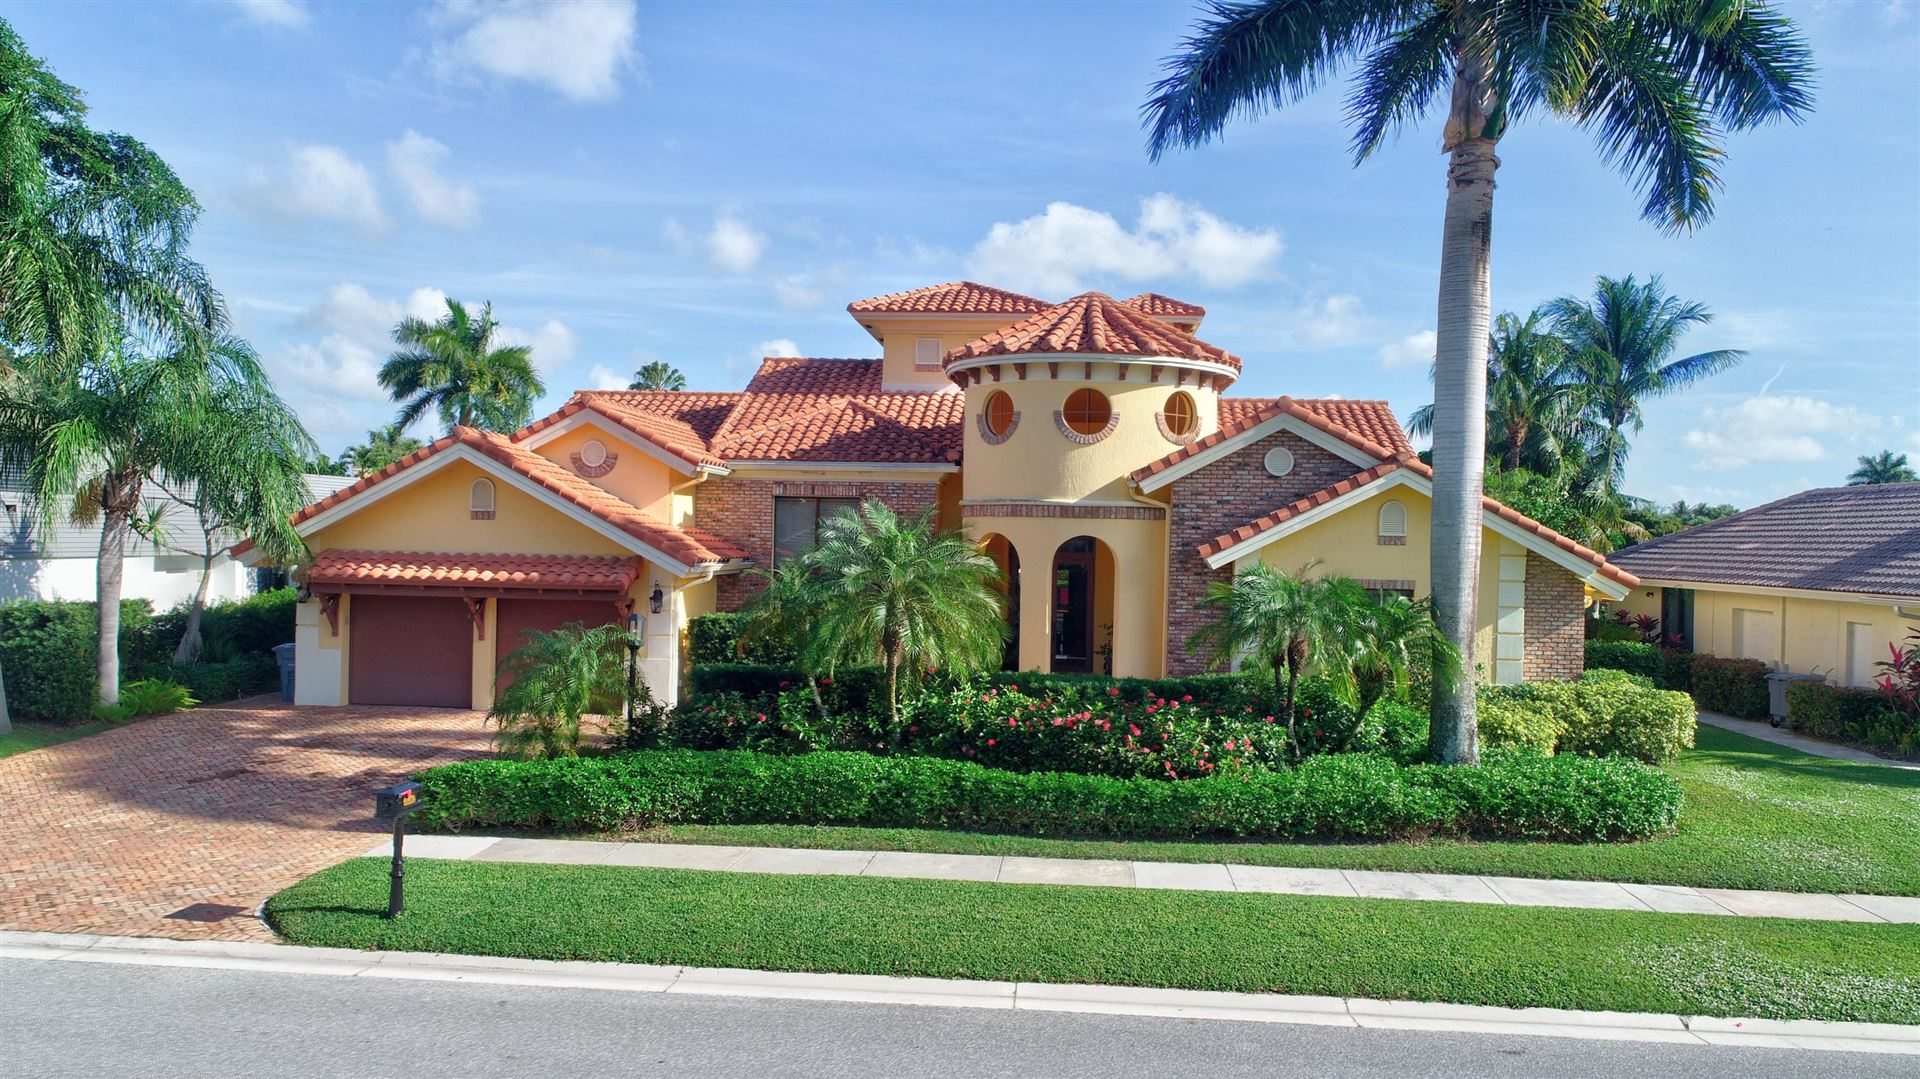 21278 Bellechasse Court, Boca Raton, FL 33433 - #: RX-10646581